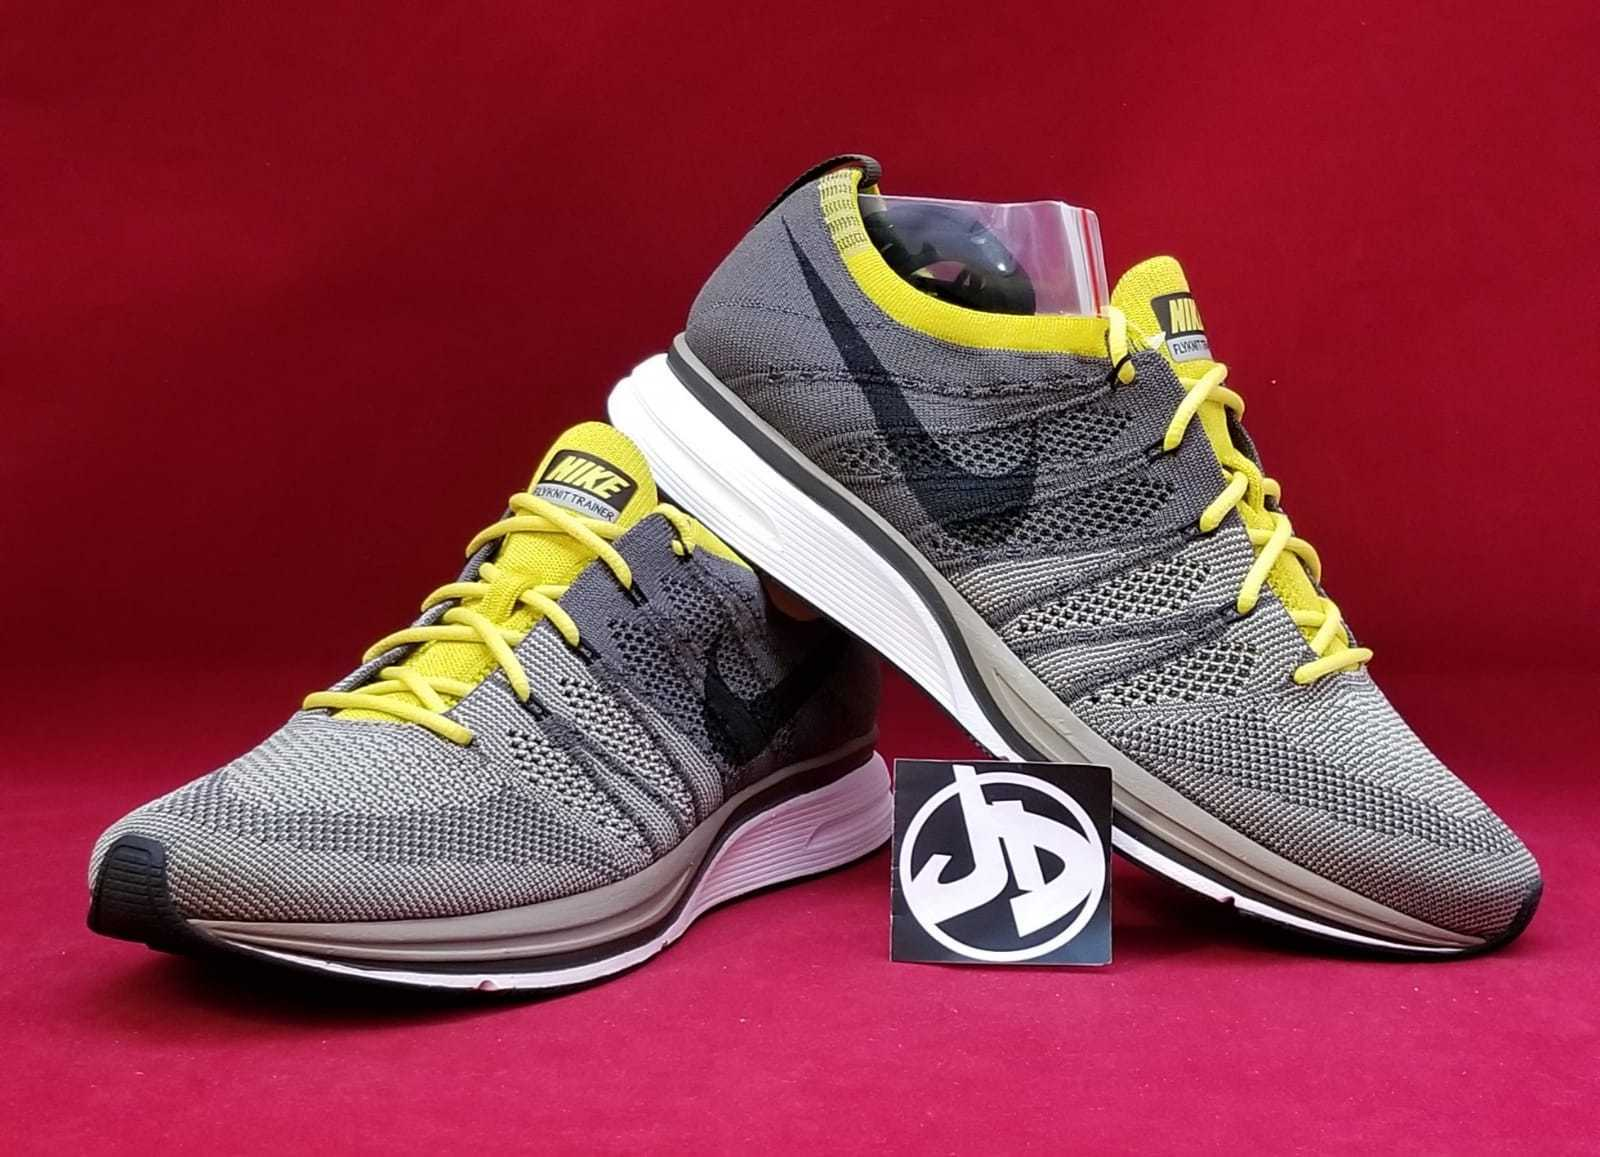 2a1e819eb573 Nike Flyknit Trainer Running Shoes Size 10 Cargo Khaki Black Yellow ...